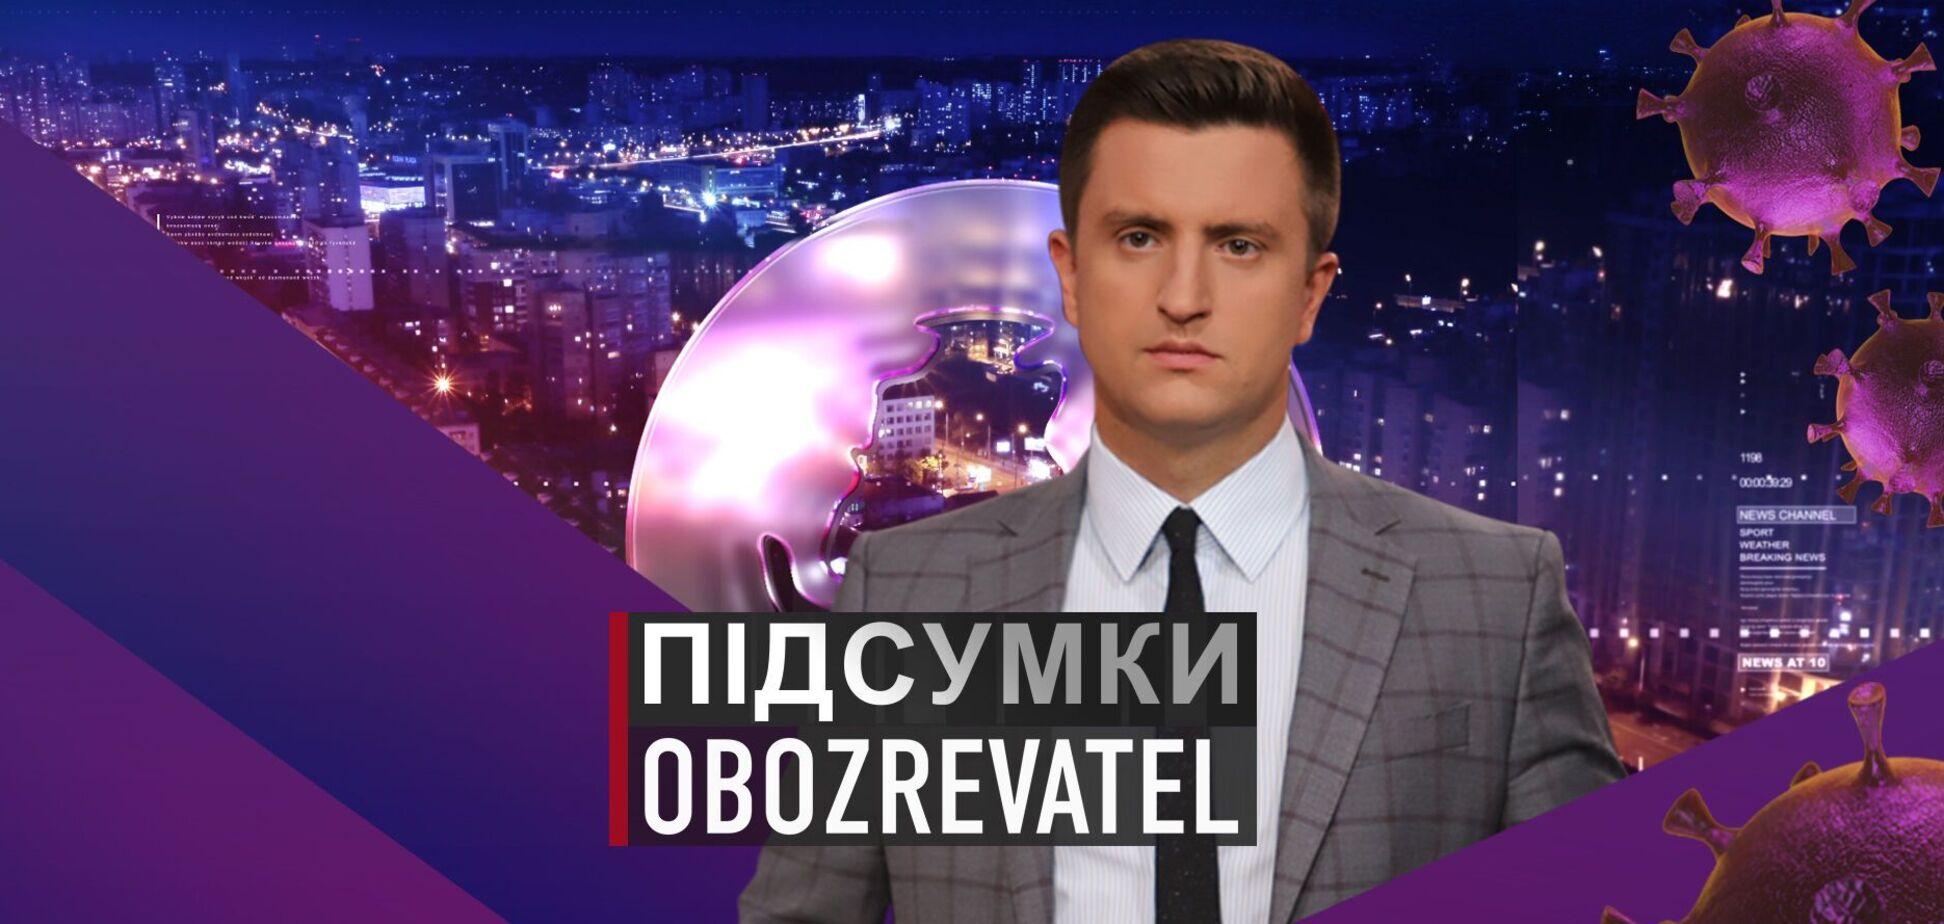 Підсумки с Вадимом Колодийчуком. Среда, 3 марта